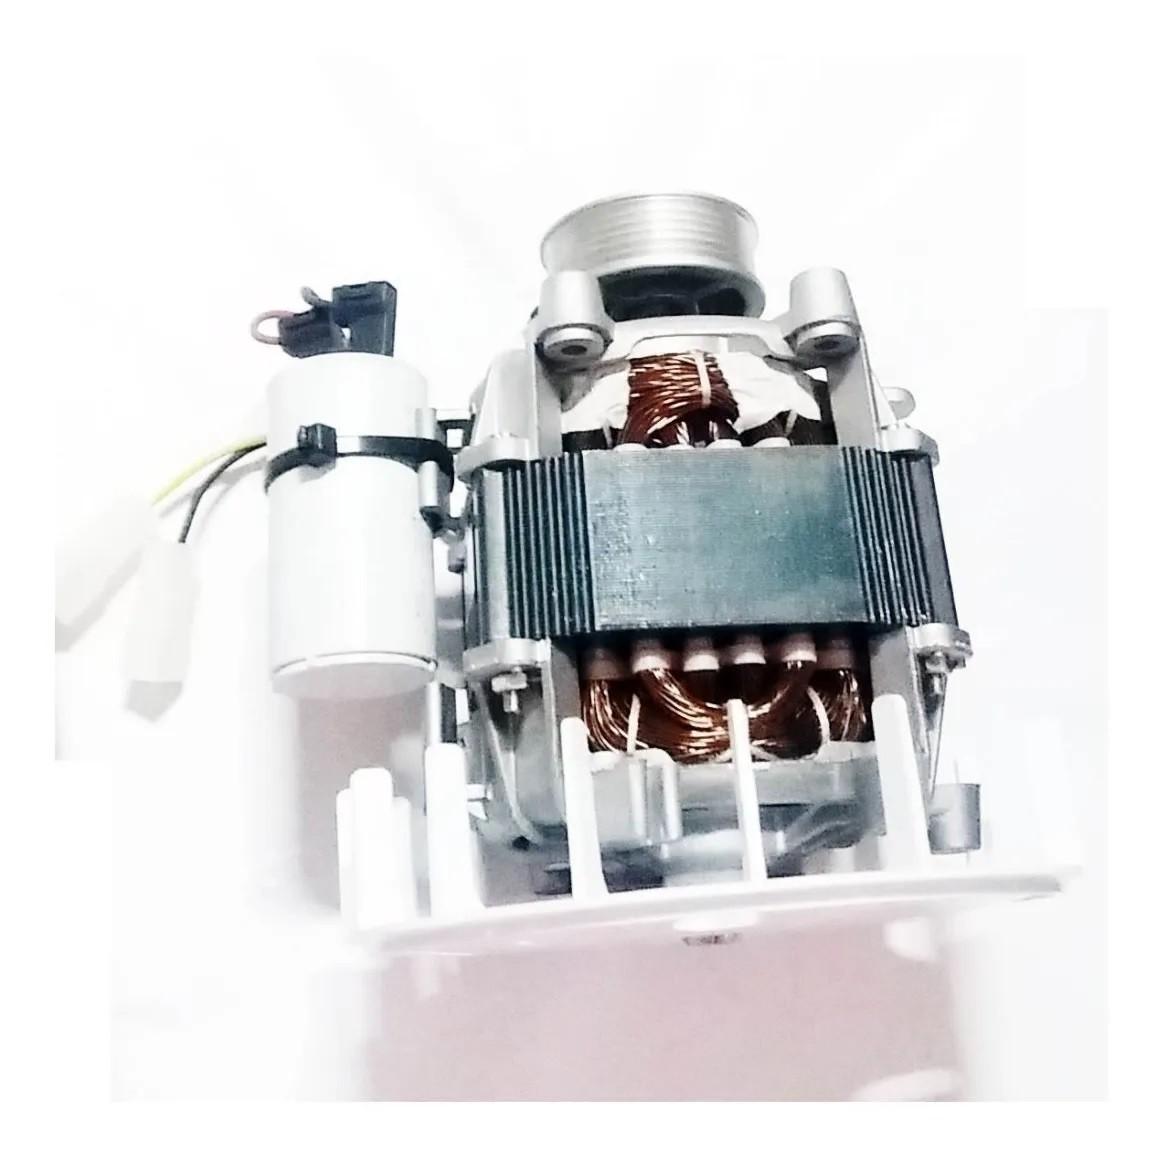 Motor Lavadora Mueller Plus Original 1/5cv - 110v Hercules Original